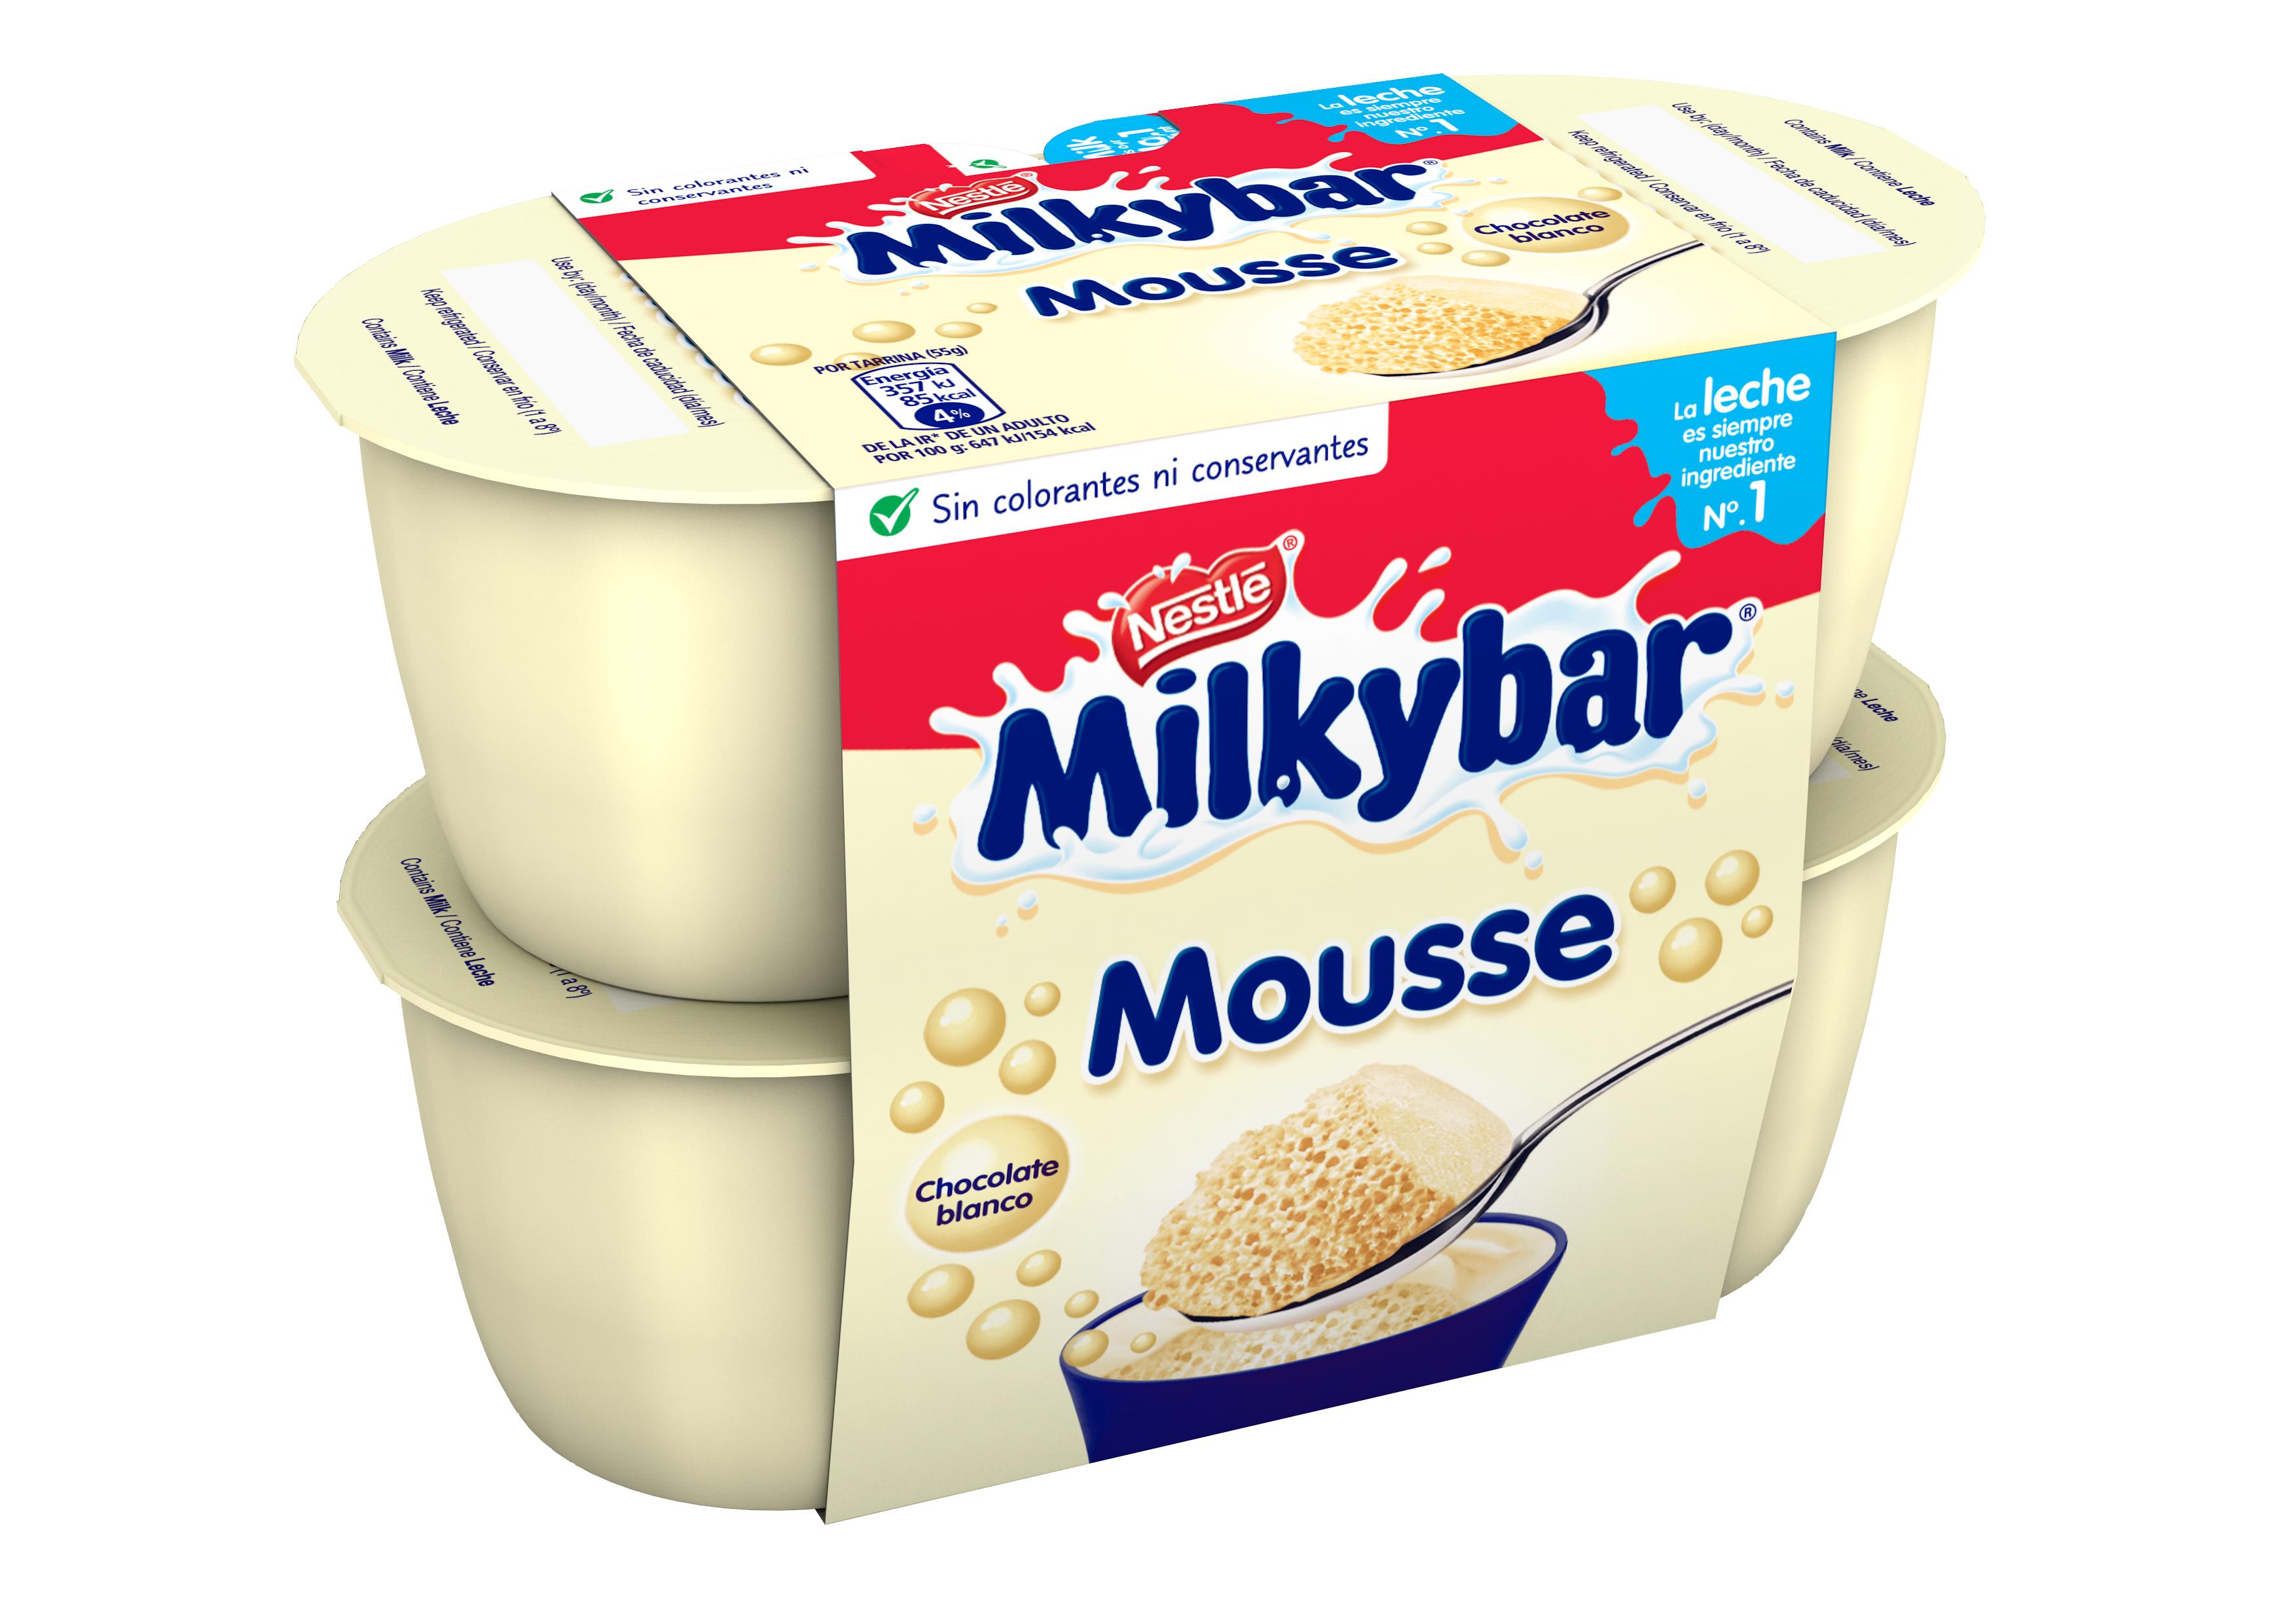 Nestle Milkybar Mousse 4x55g for 75p @ Sainsbury's